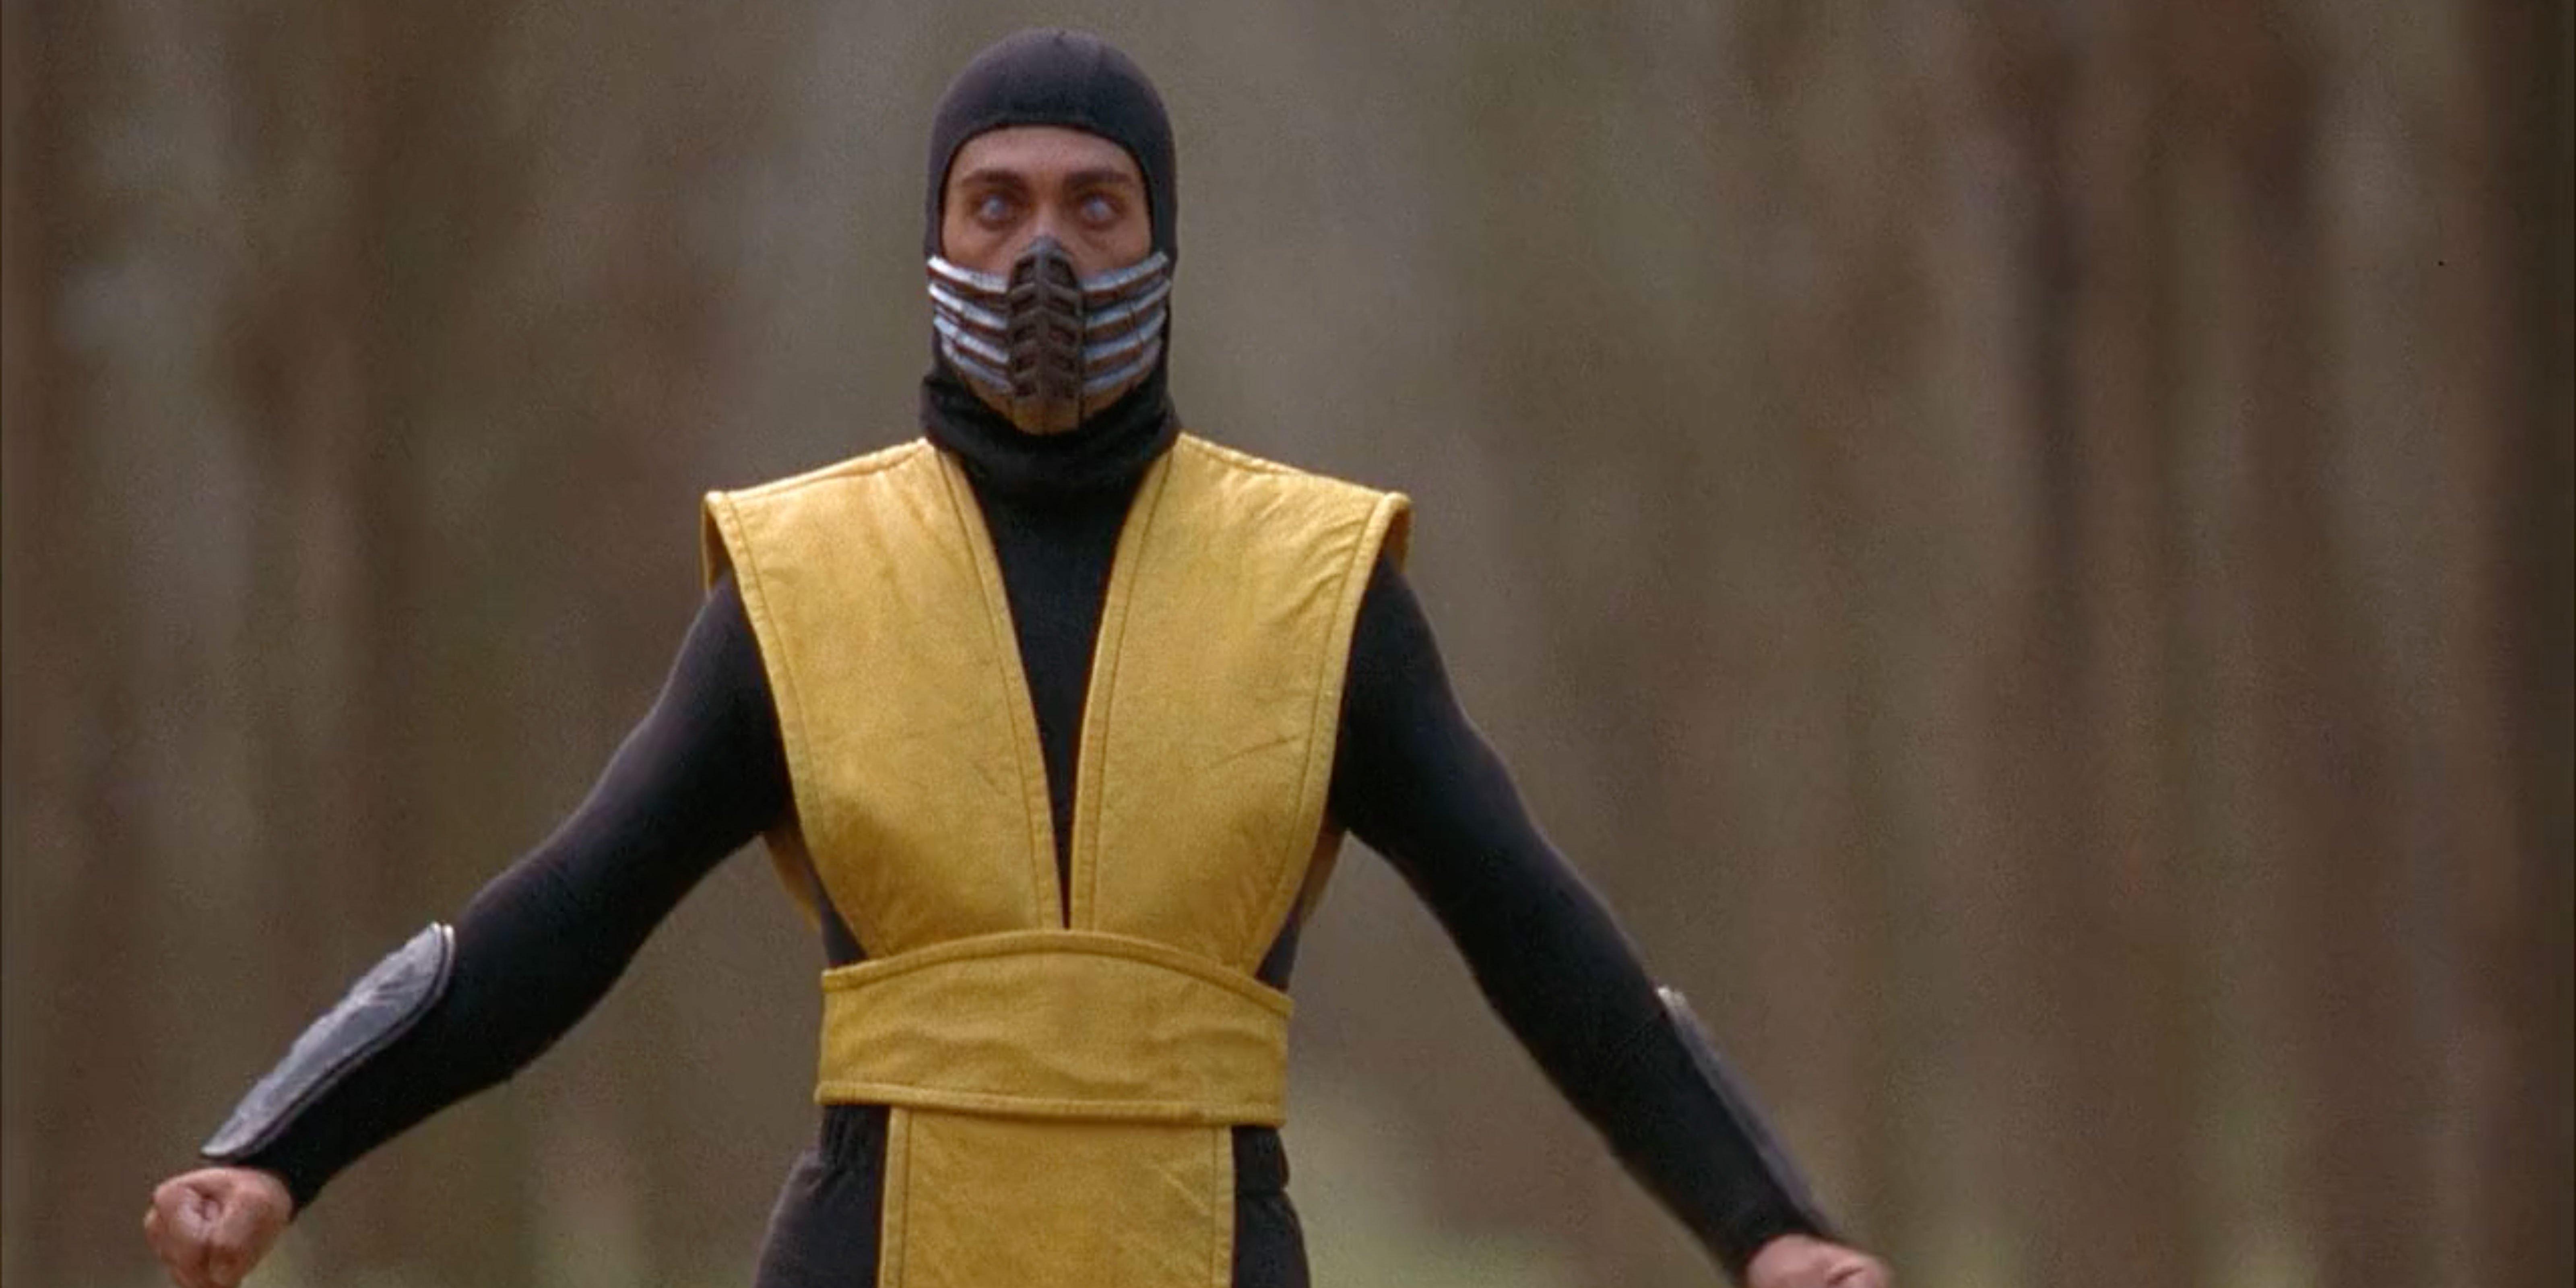 Scorpion prepares to fight in Mortal Kombat